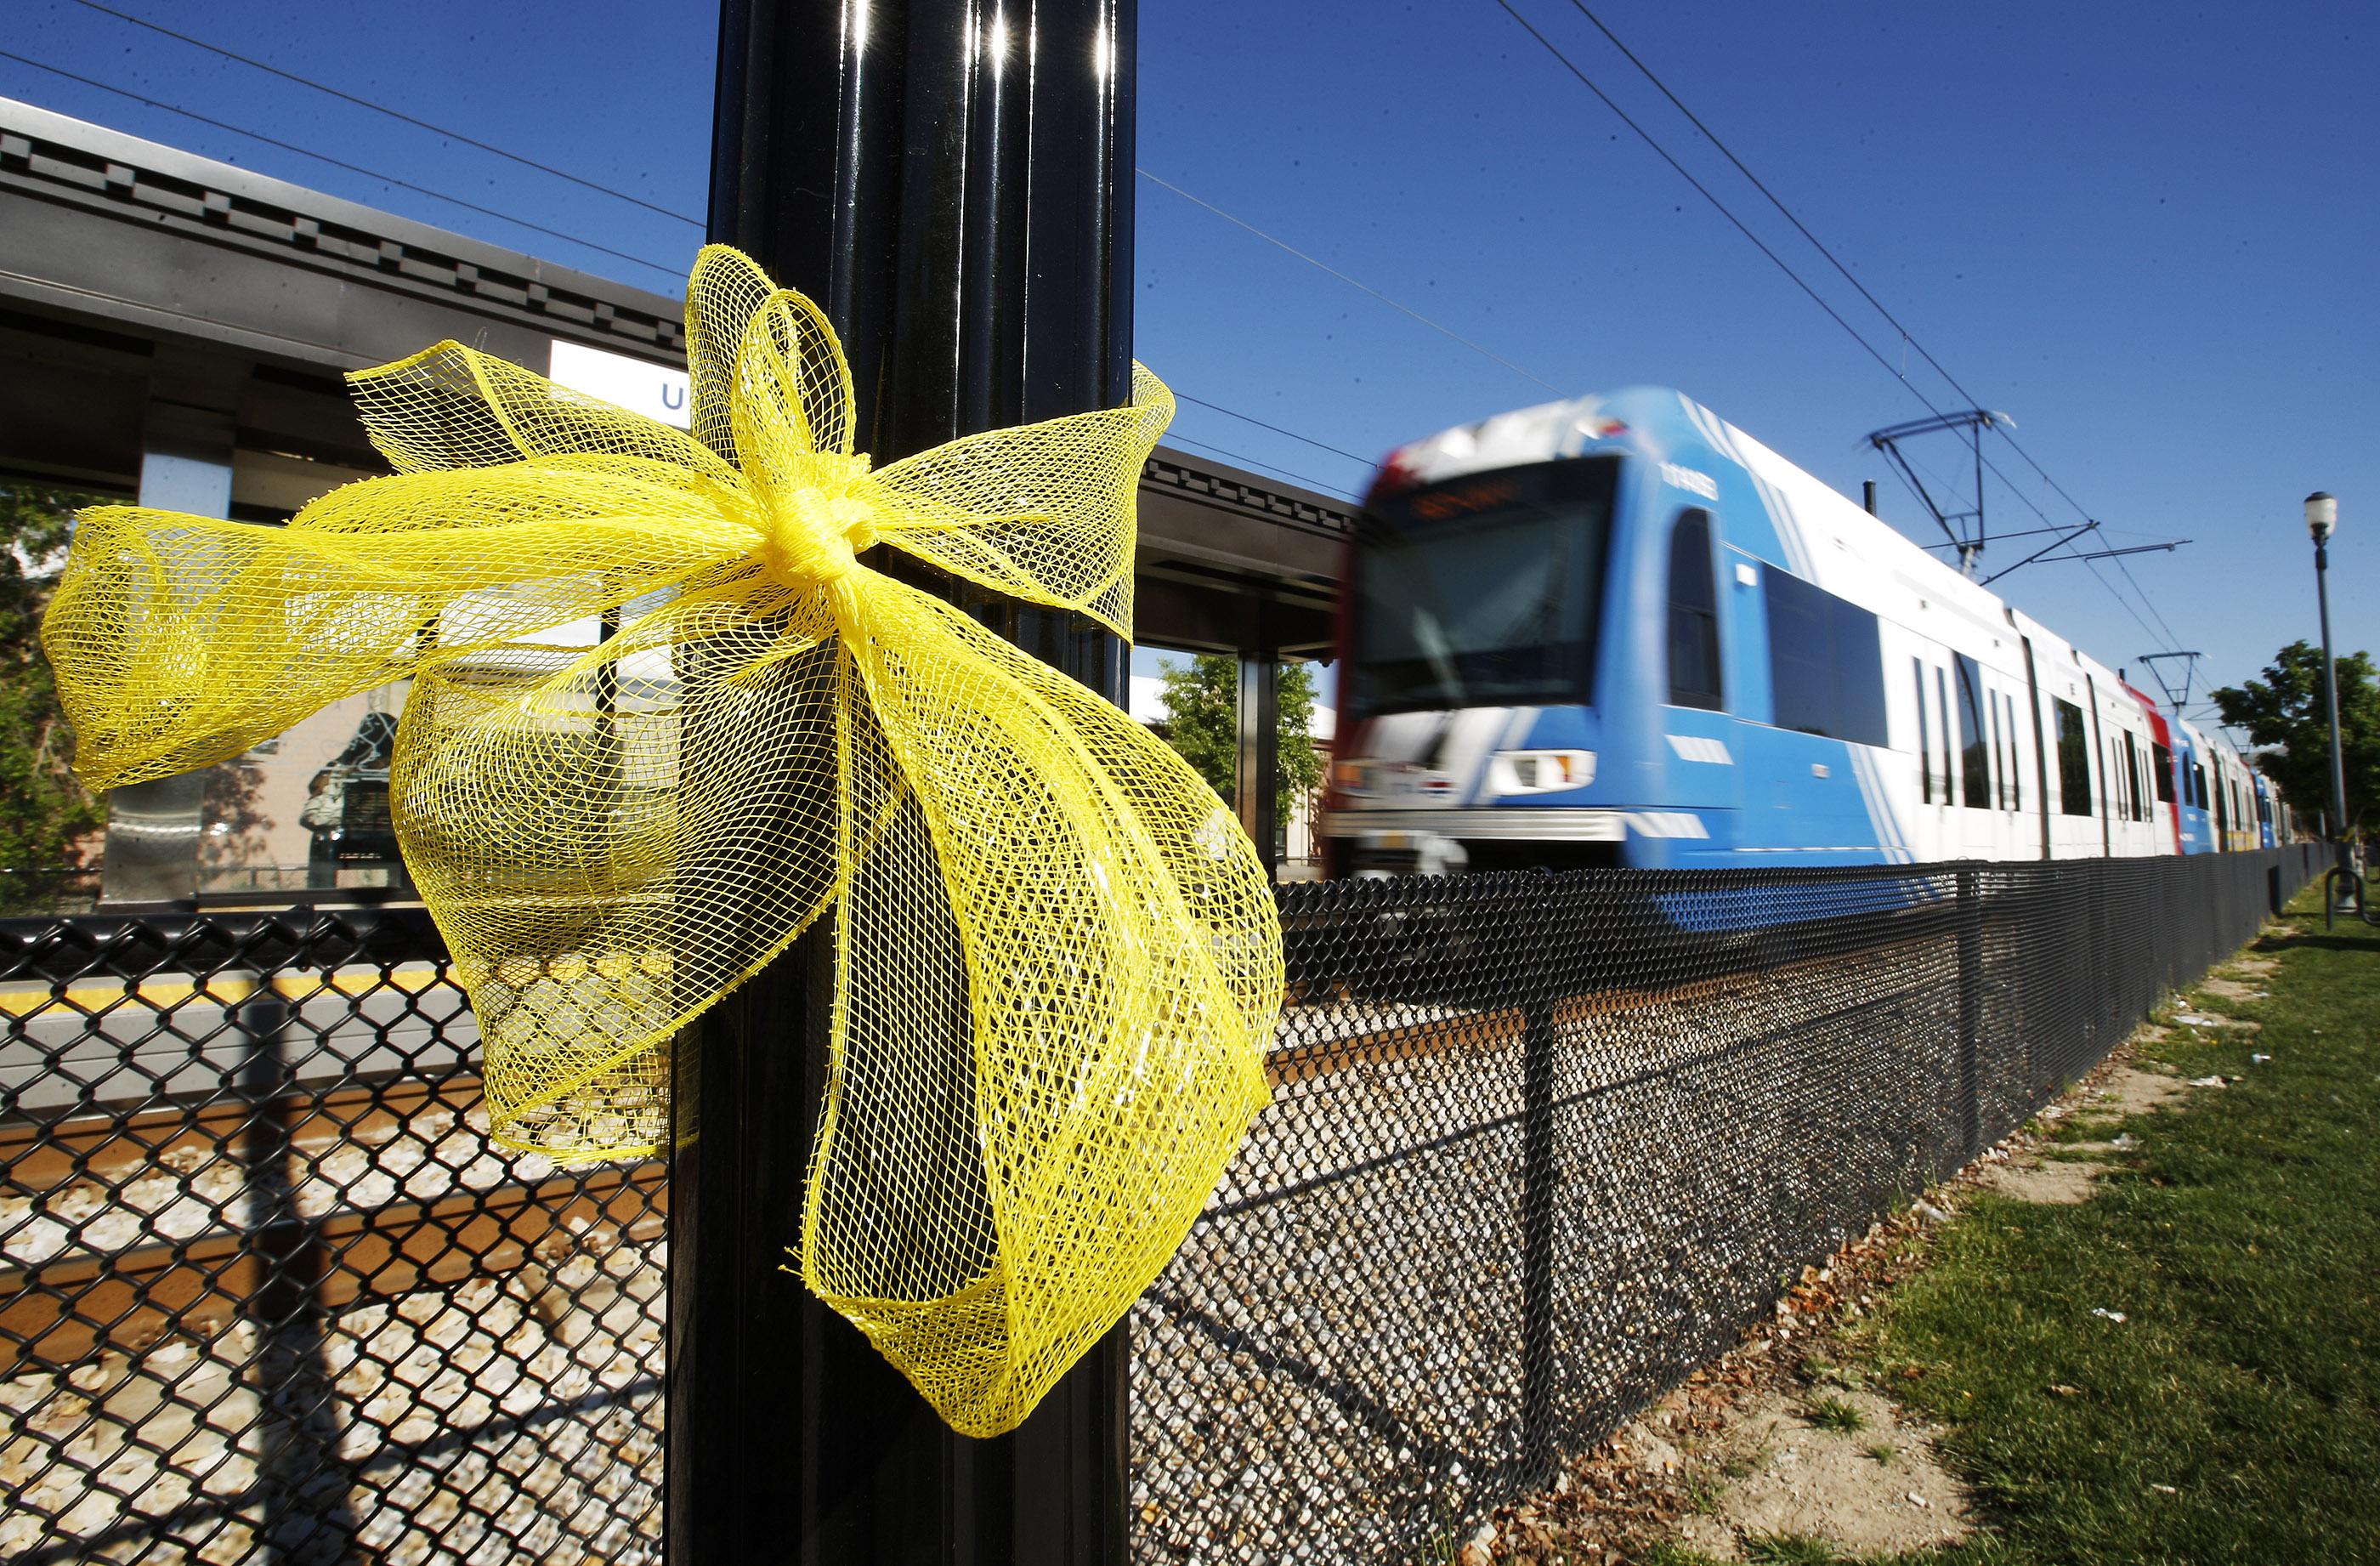 UTA to briefly halt buses, trains in honor of slain worker